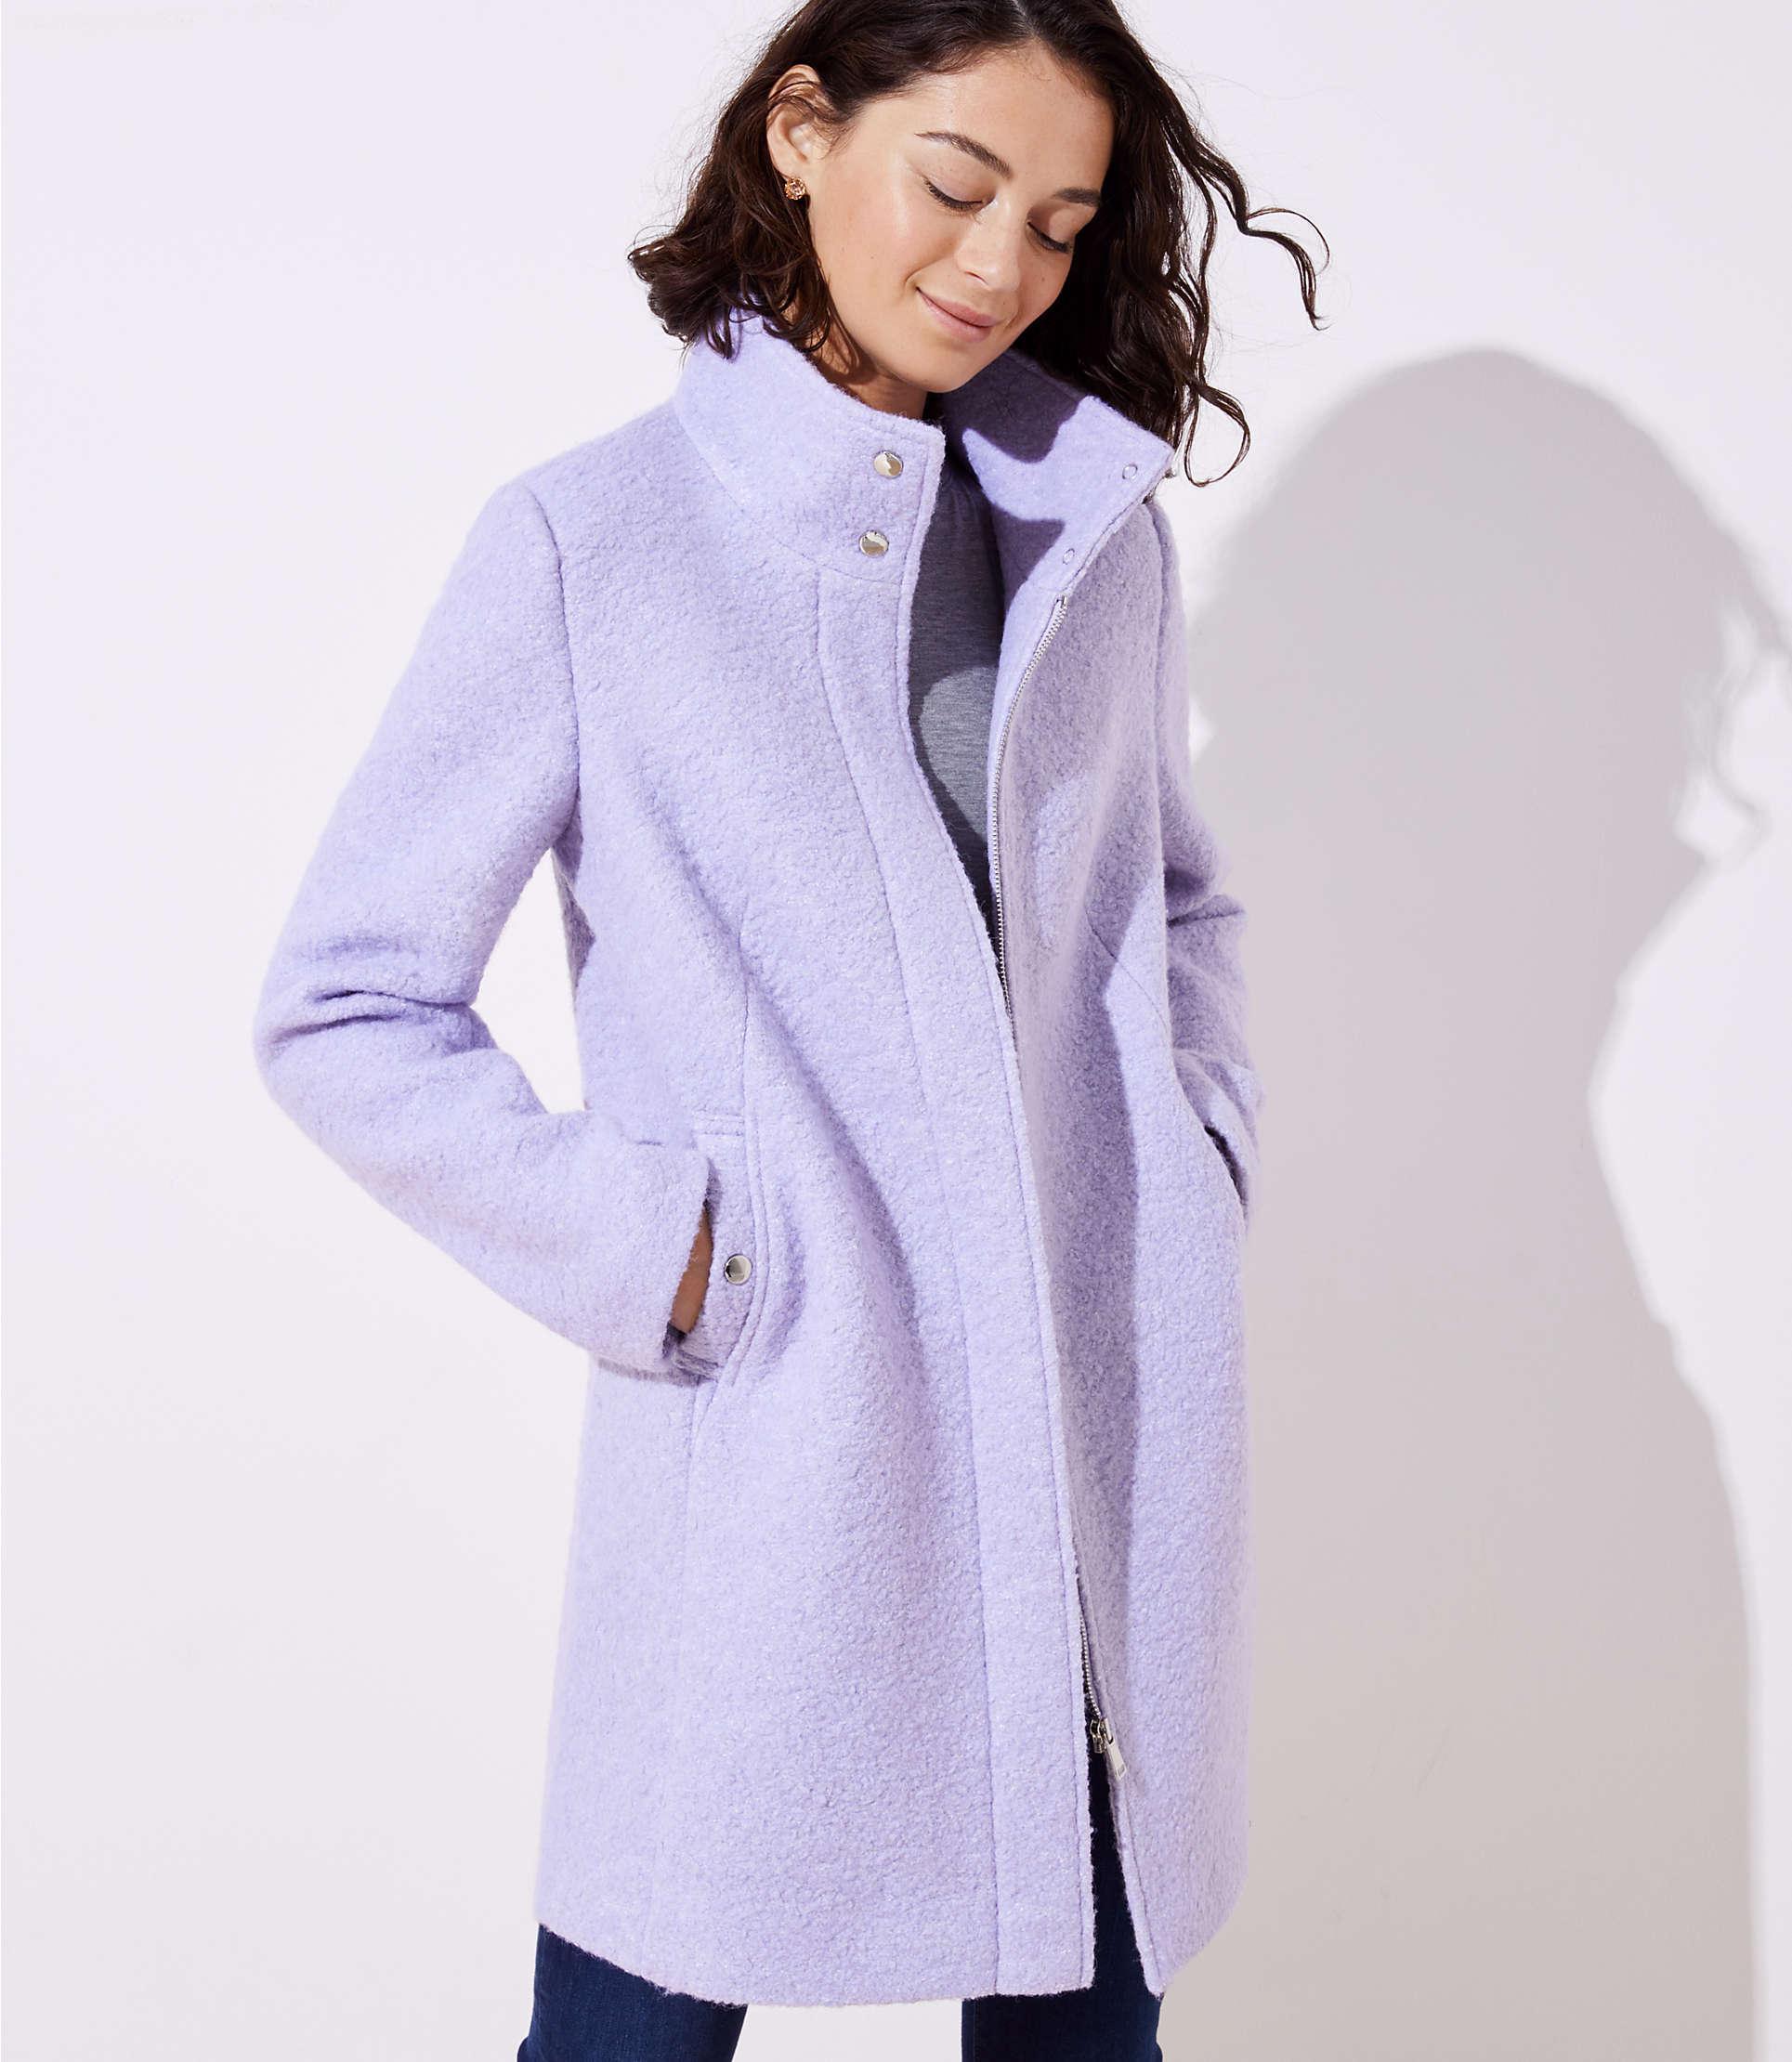 739097c91858 LOFT Petite Funnel Neck Coat in Purple - Lyst